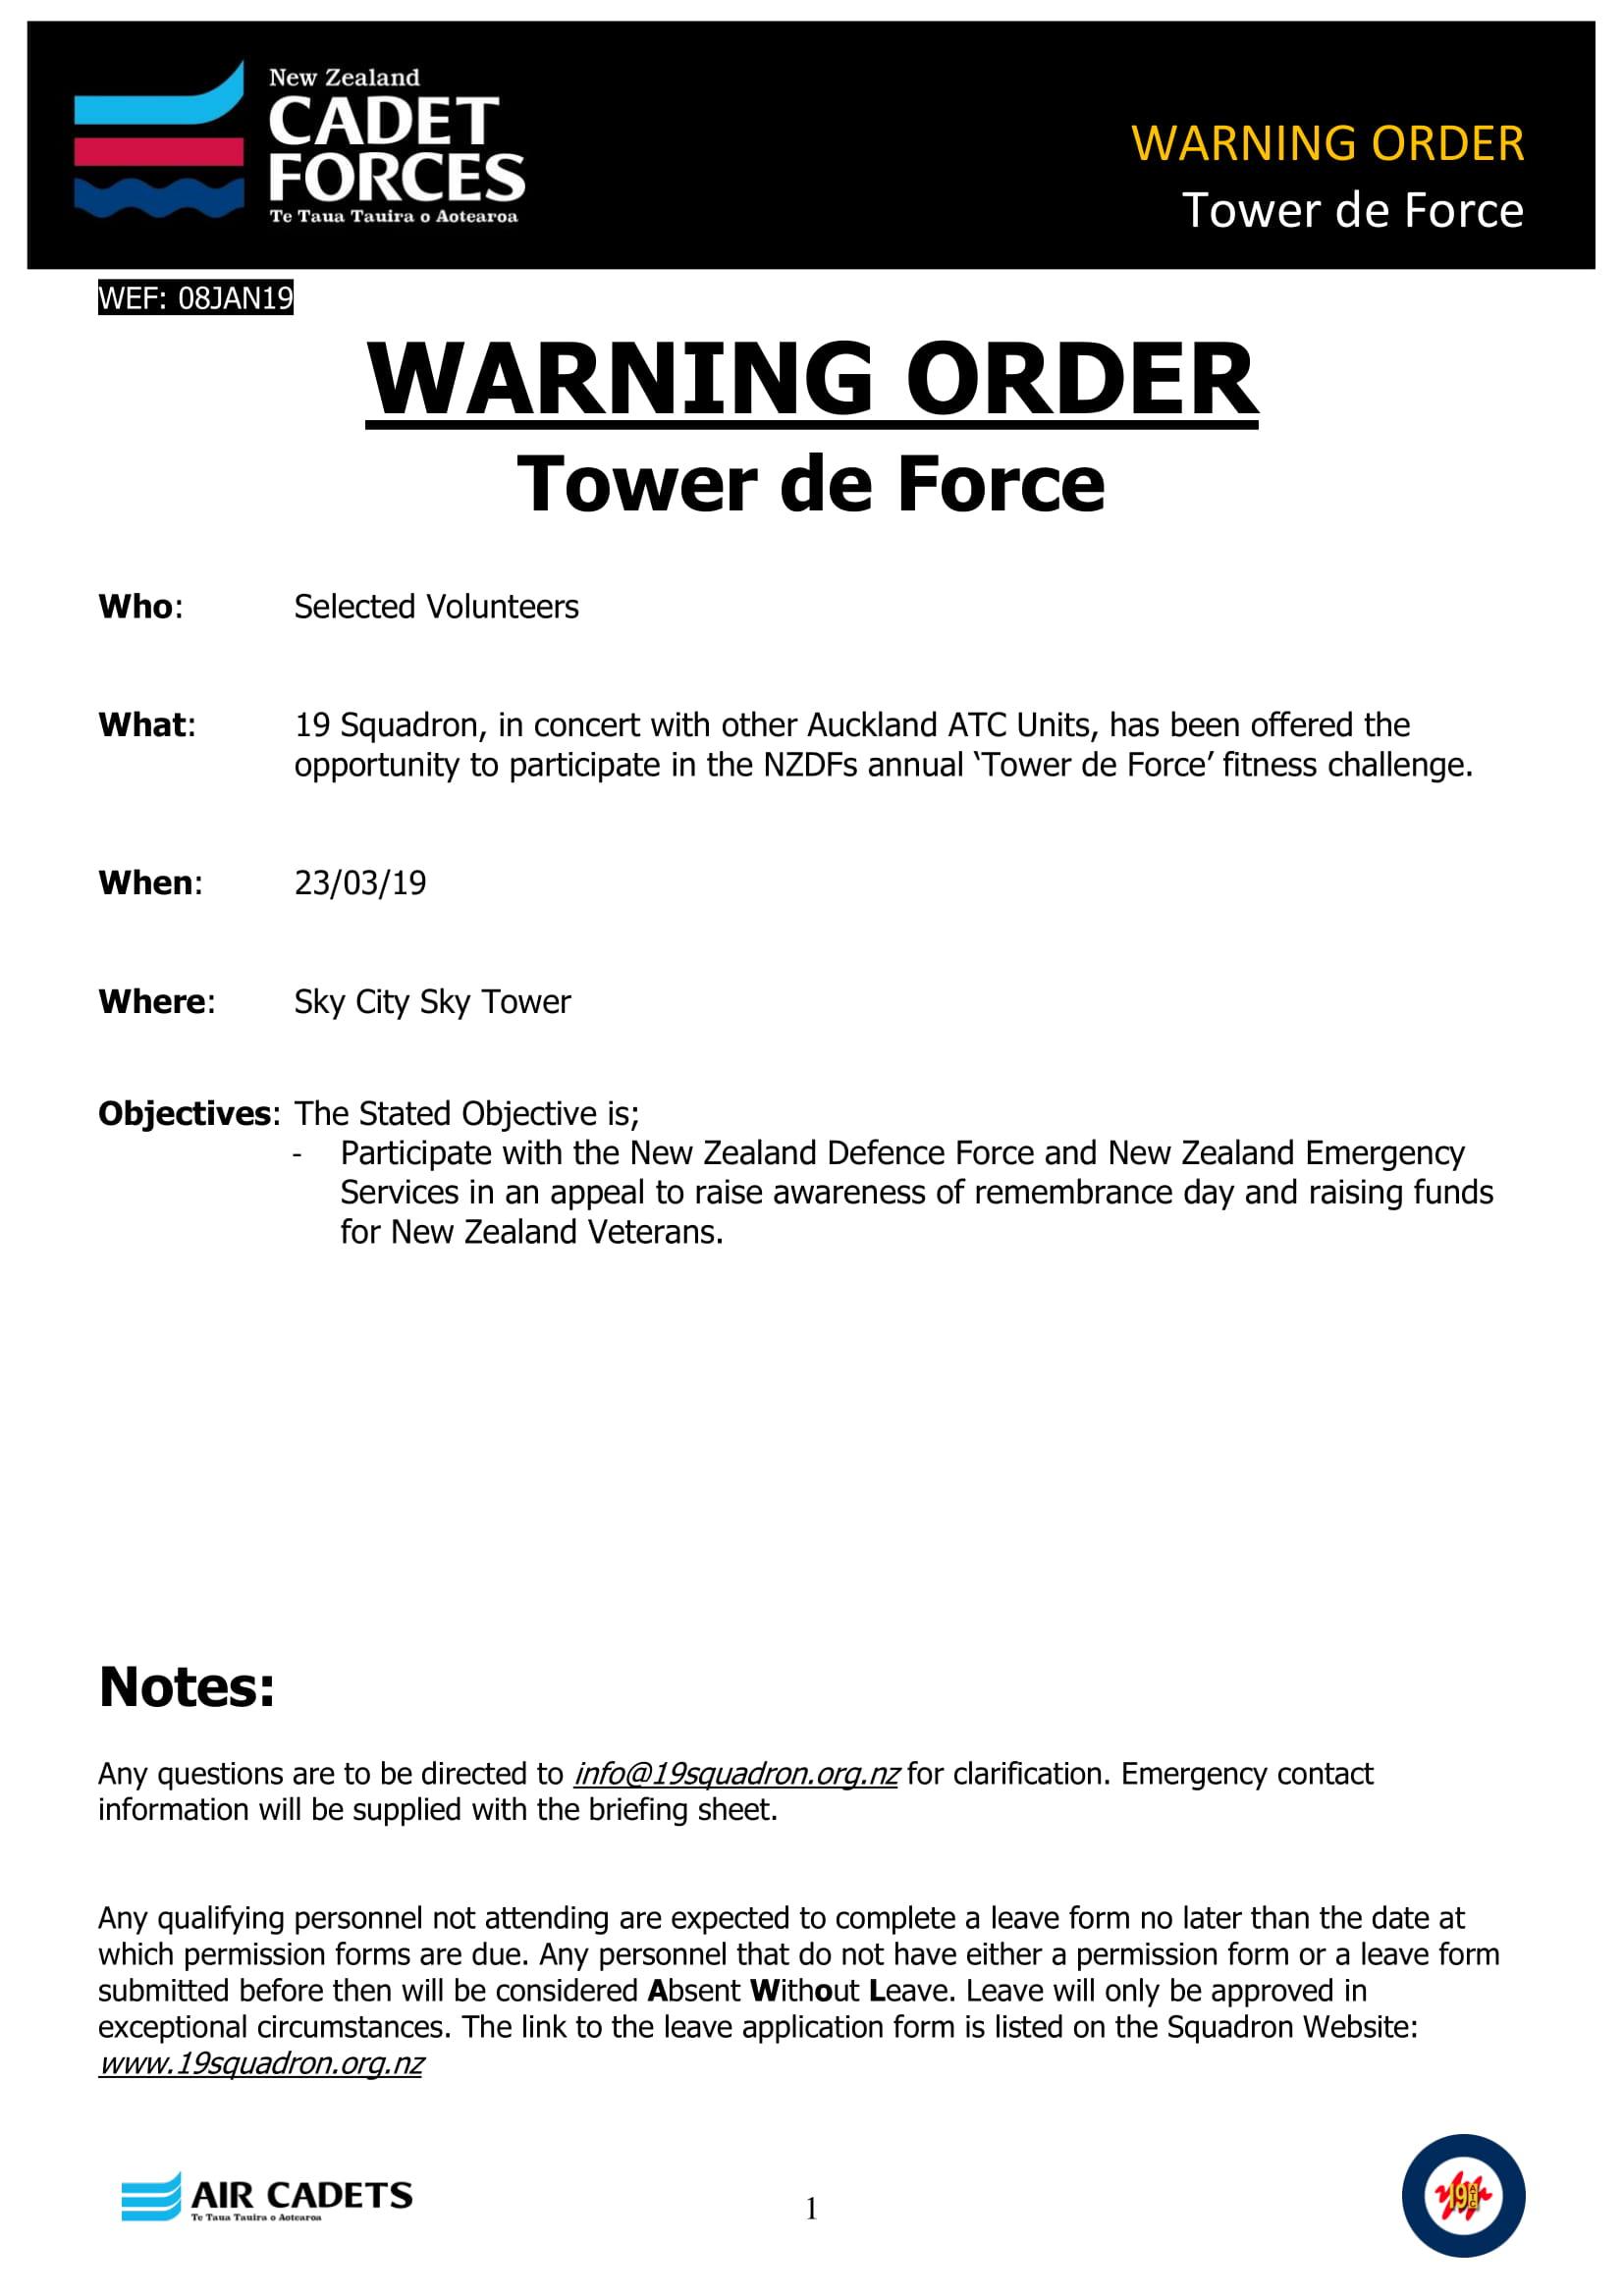 Tower de Force - Warning Order-1.jpg